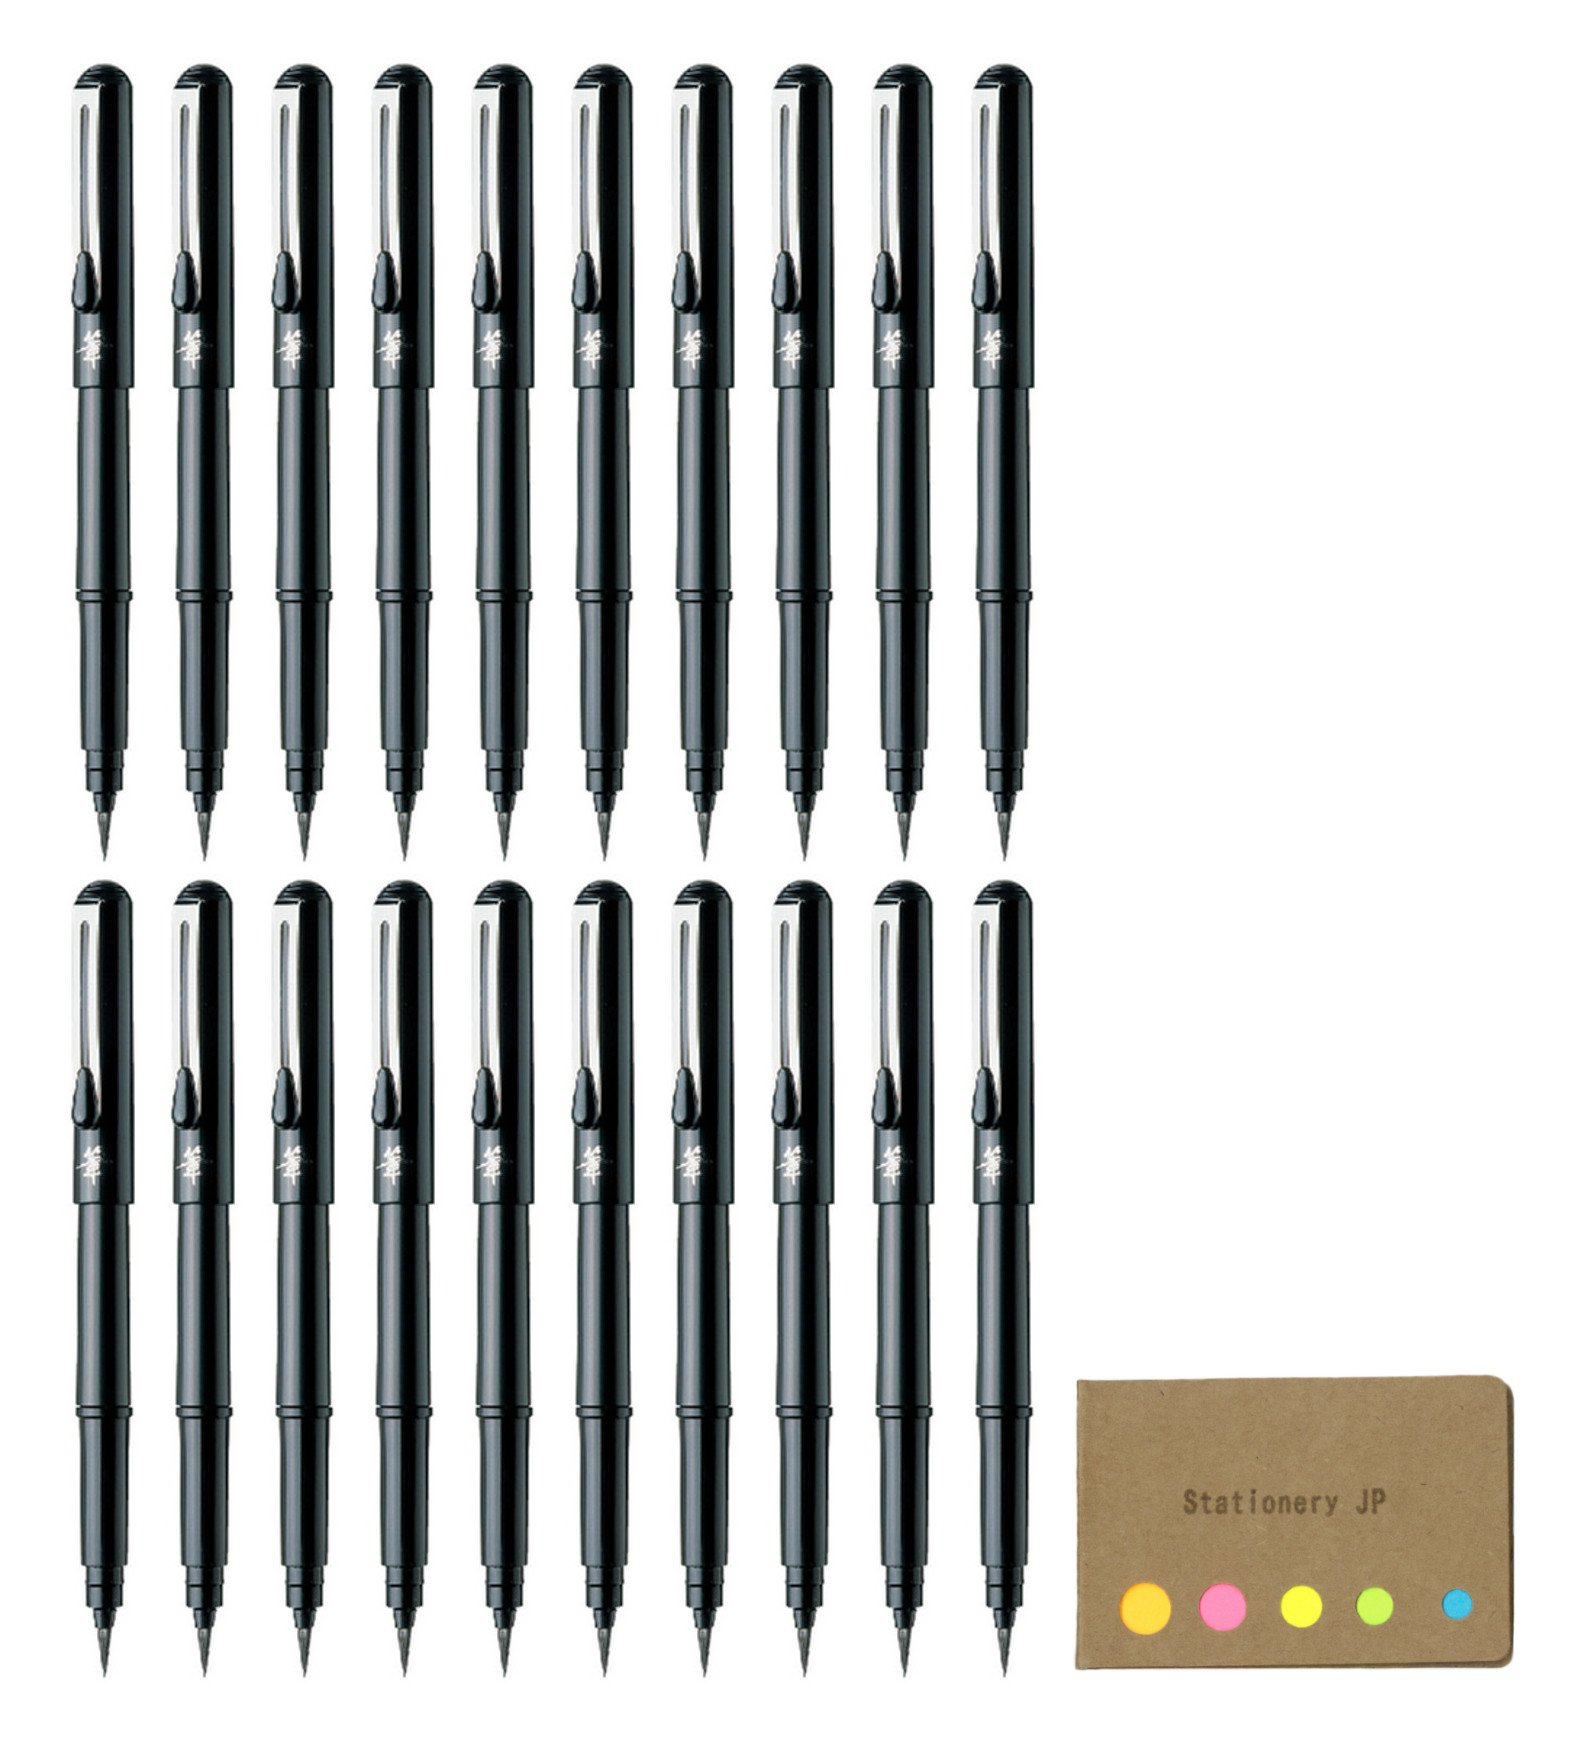 Pentel Arts Pocket Brush Pen (XGFKP-A), 20-pack, Sticky Notes Value Set